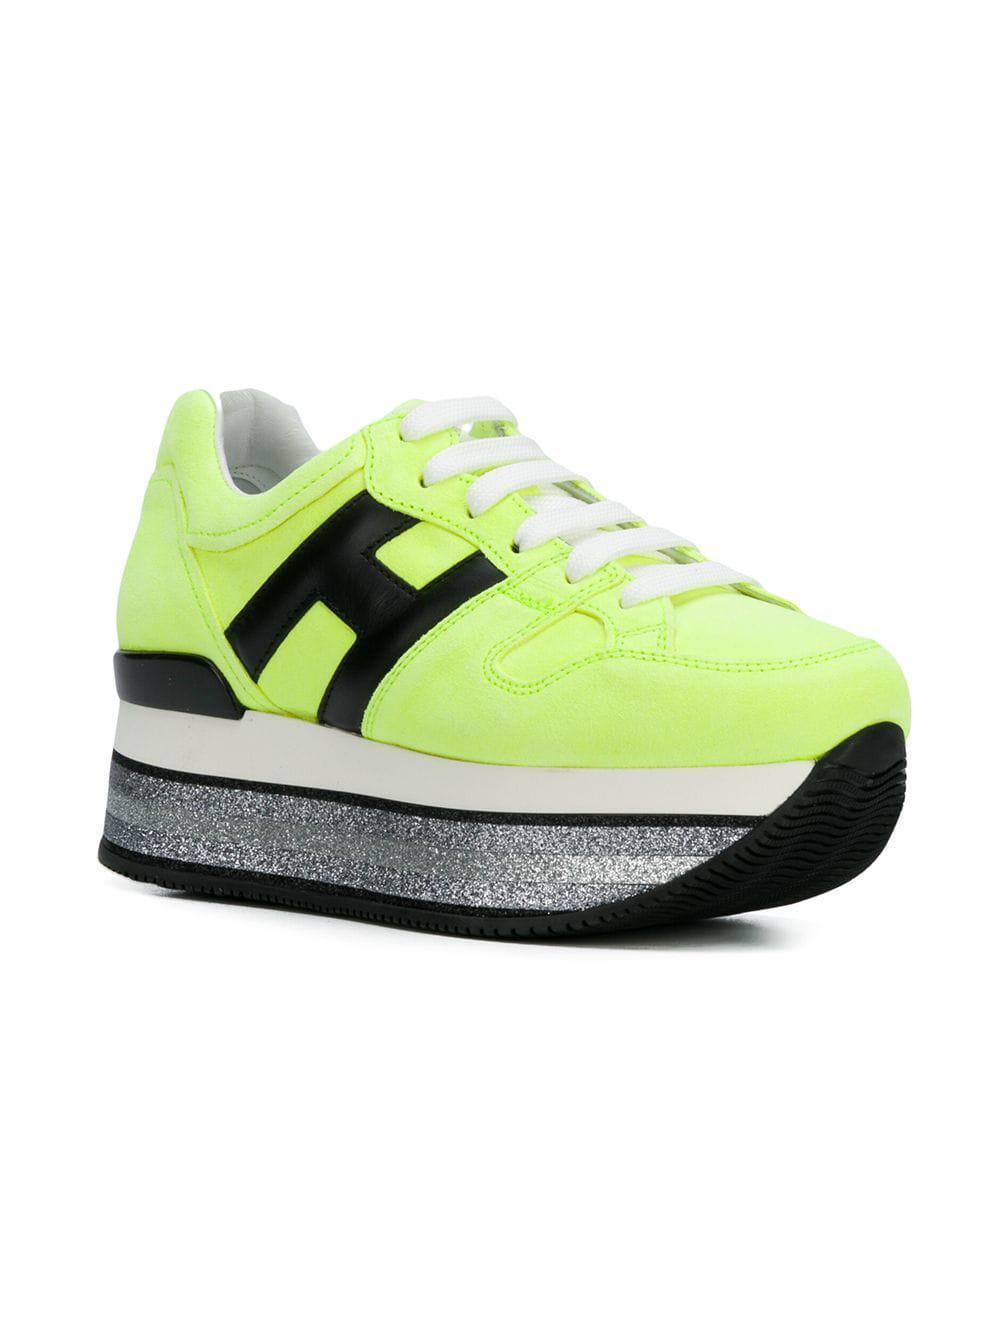 be7395c25ebb4 Hogan Maxi H222 Platform Sneakers in Yellow - Lyst